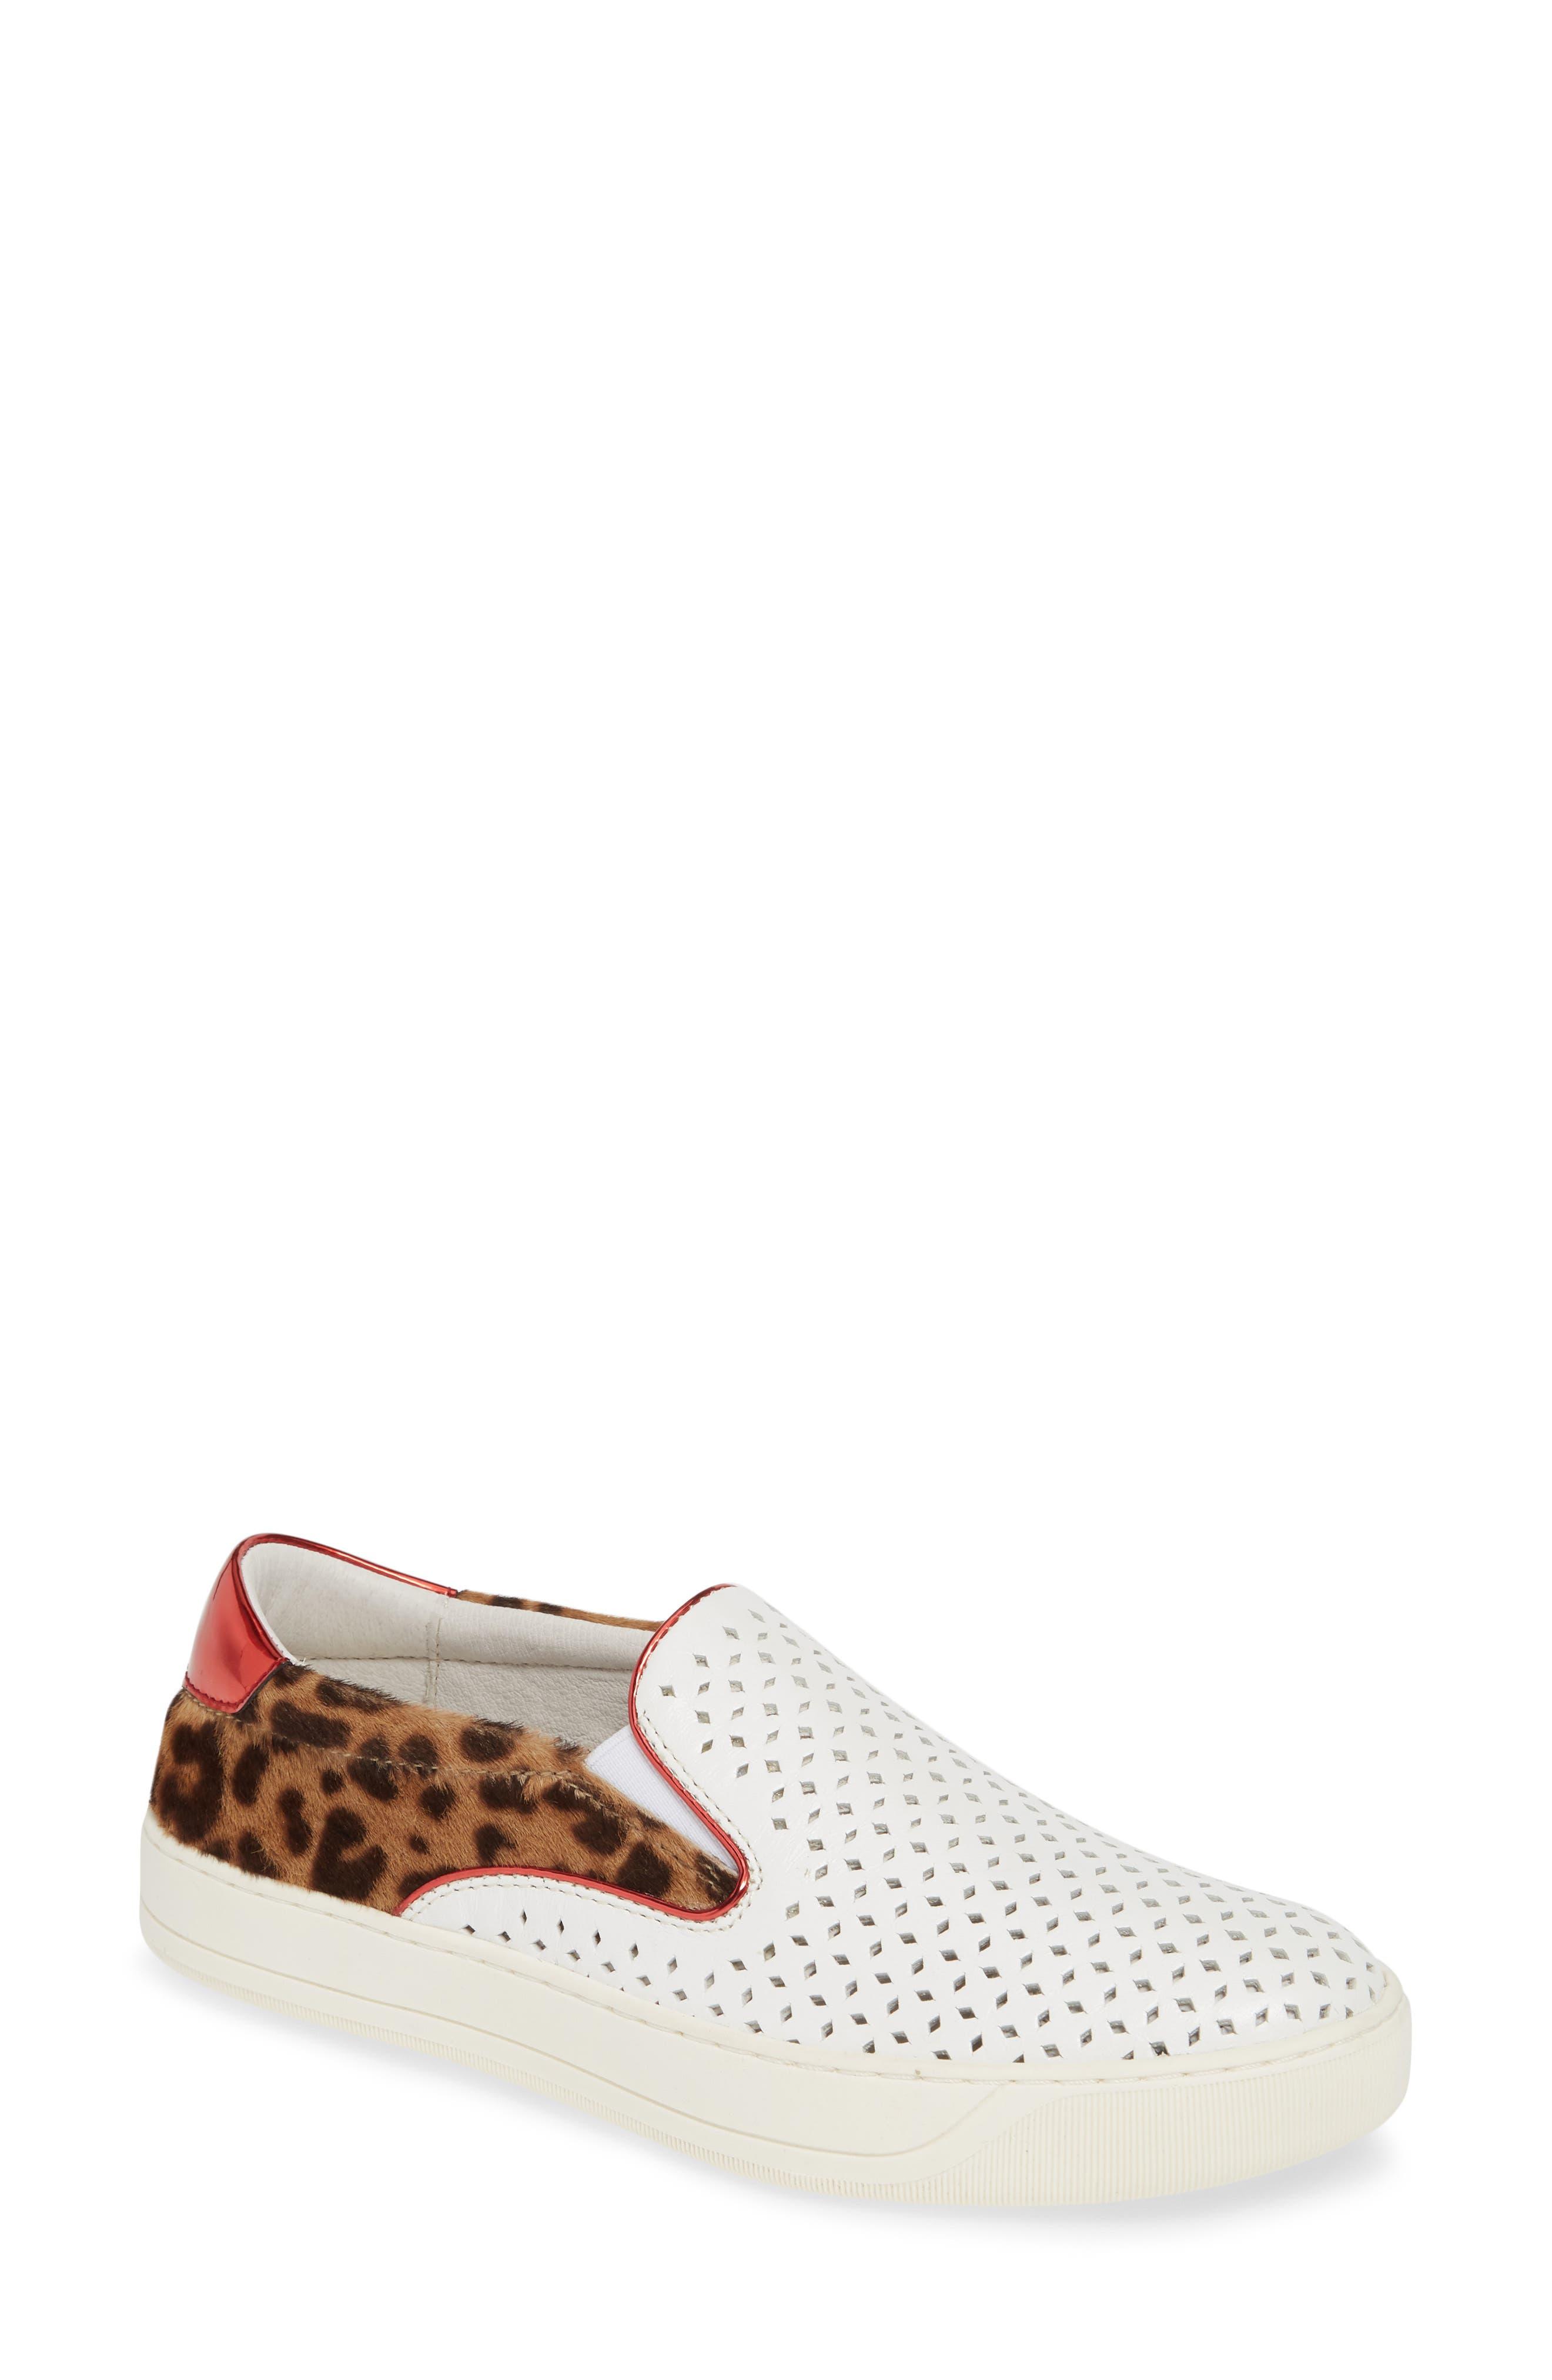 Johnston & Murphy Elaine Perforated Genuine Calf Hair Slip-On Sneaker